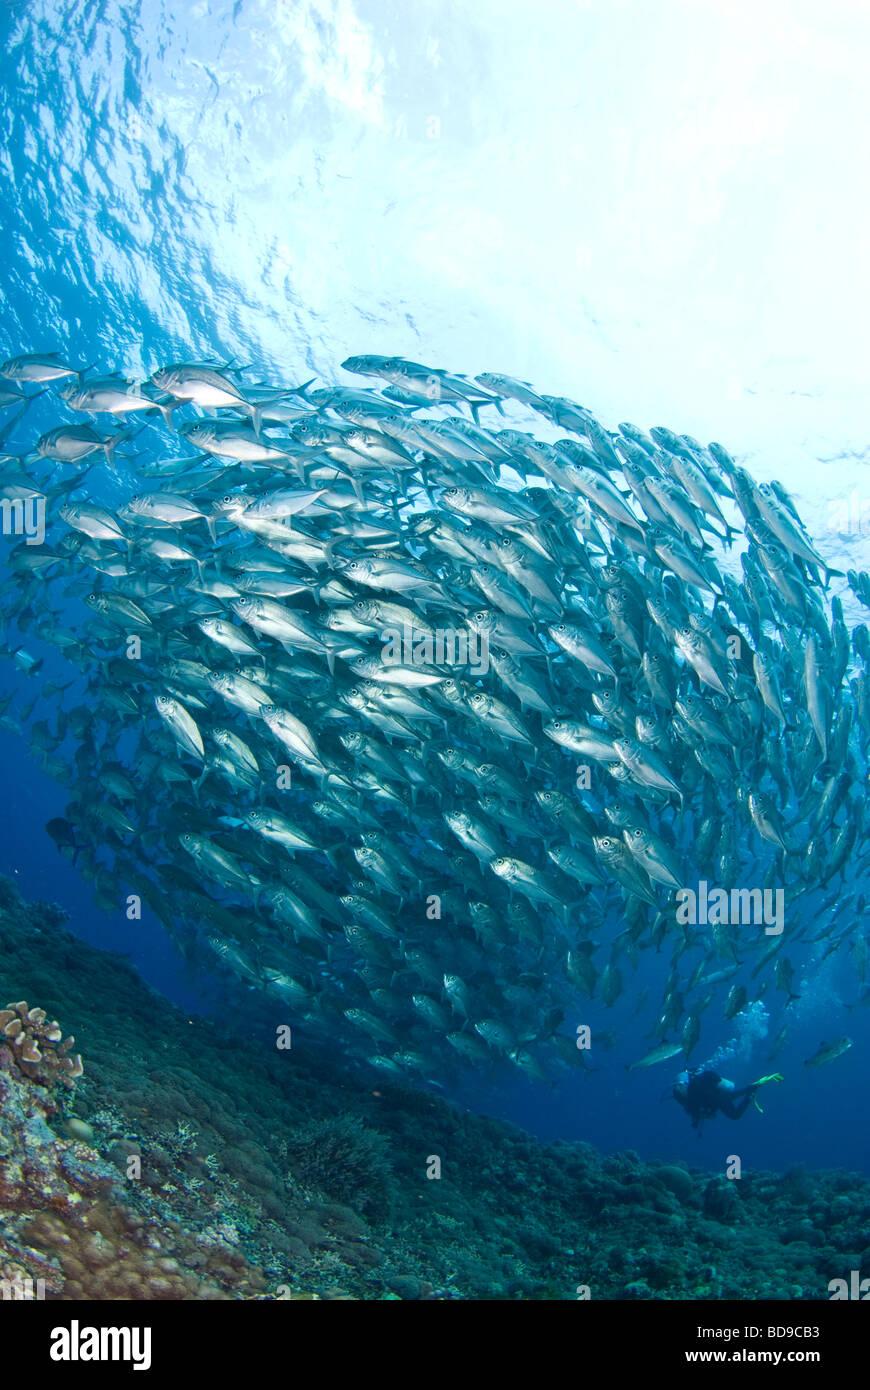 Schooling big eye jackfish and scuba diver, Tubbataha, Philippines - Stock Image